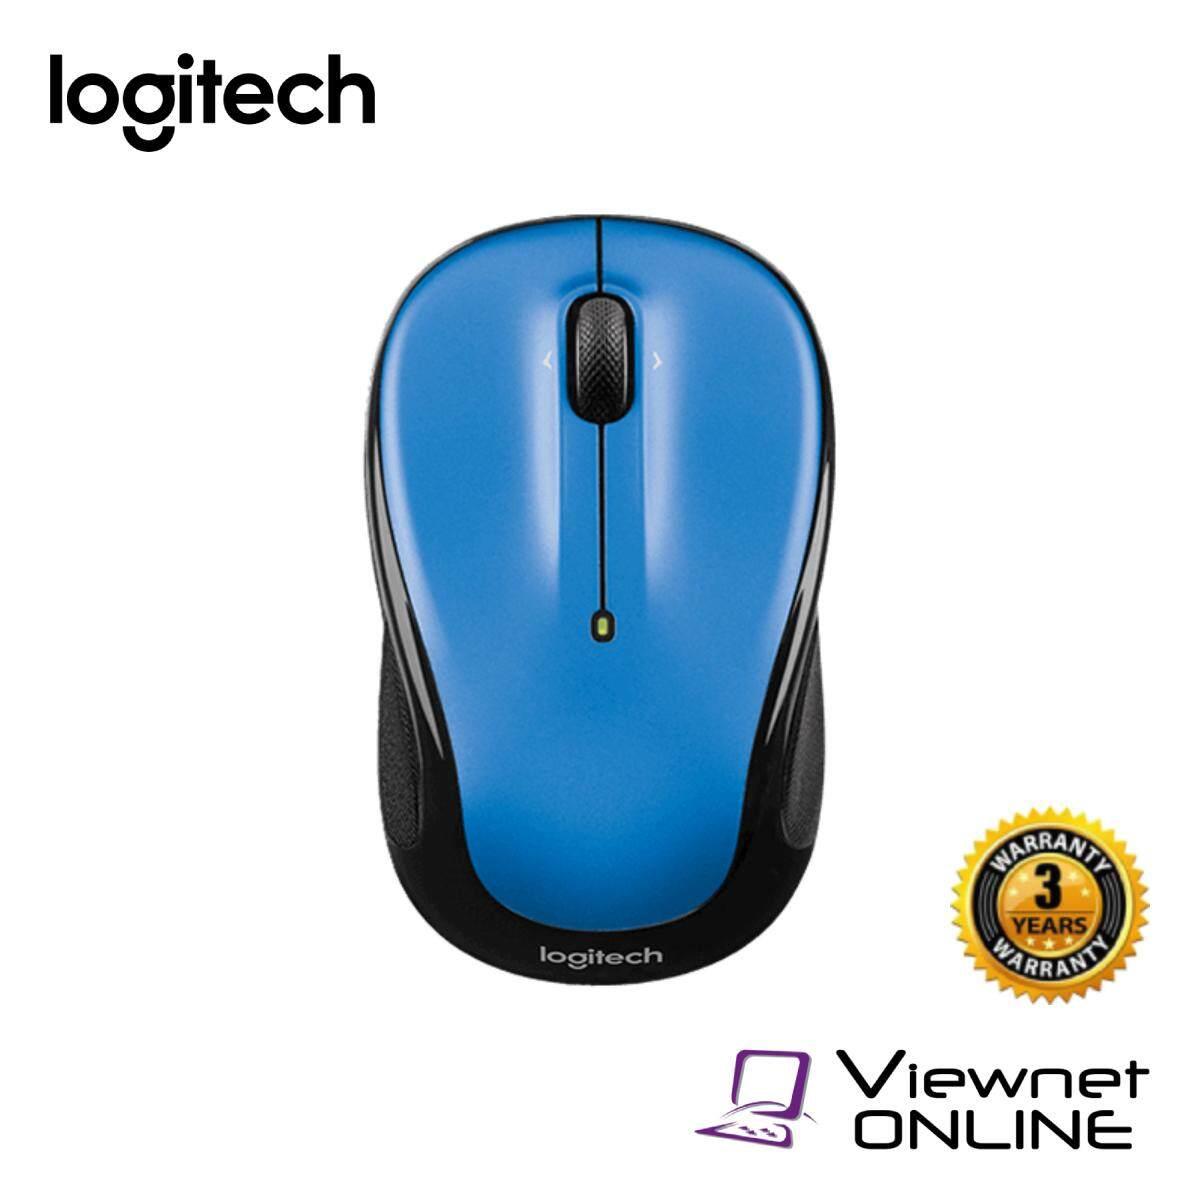 Logitech M325 Wireless Mouse (Peacock Blue / Light Silver / Dark SIlver)